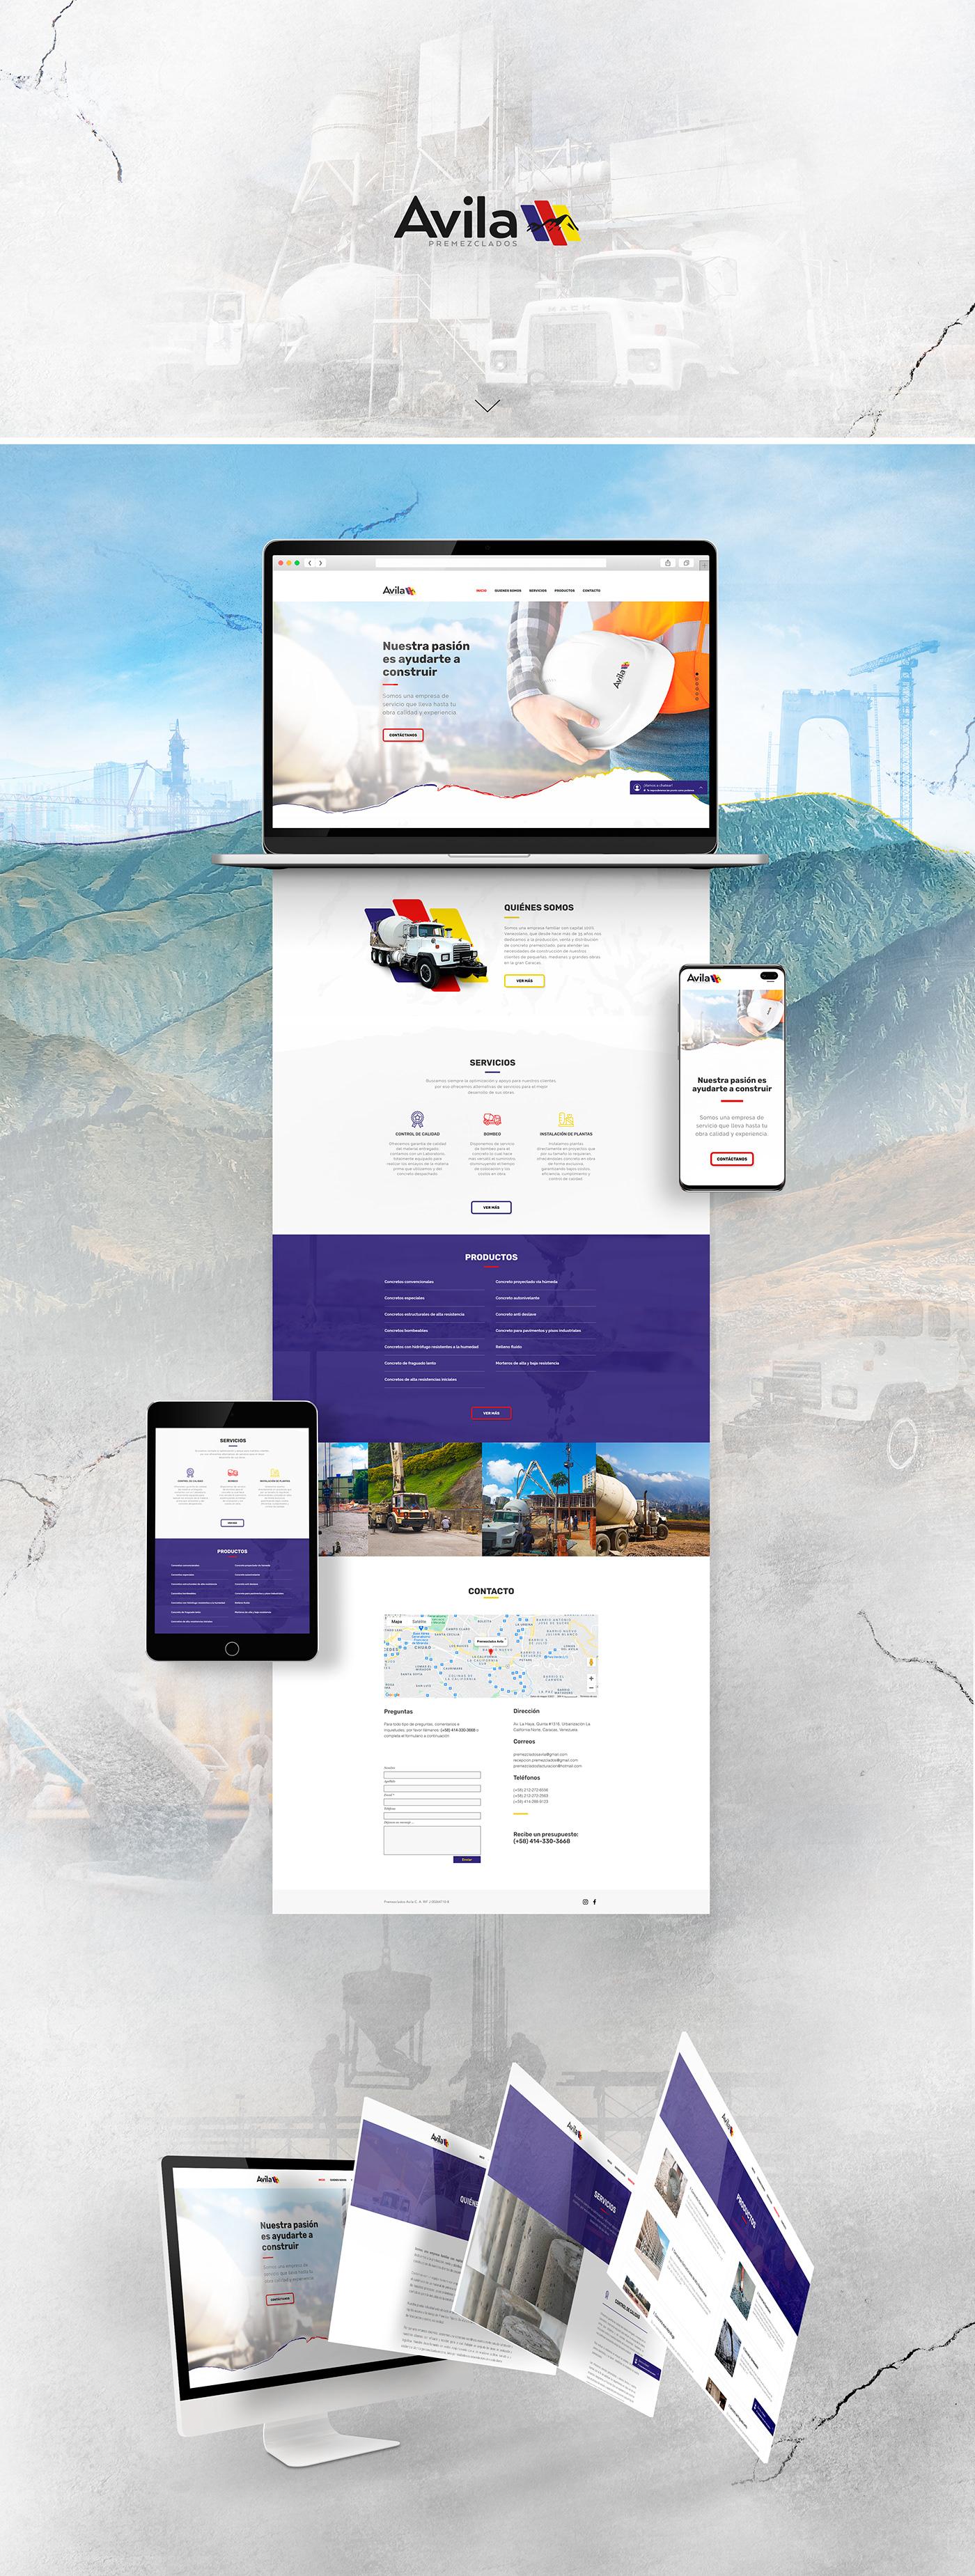 concrete construccion construction diseño gráfico Diseño web graphic design  services Truck Web Web Design